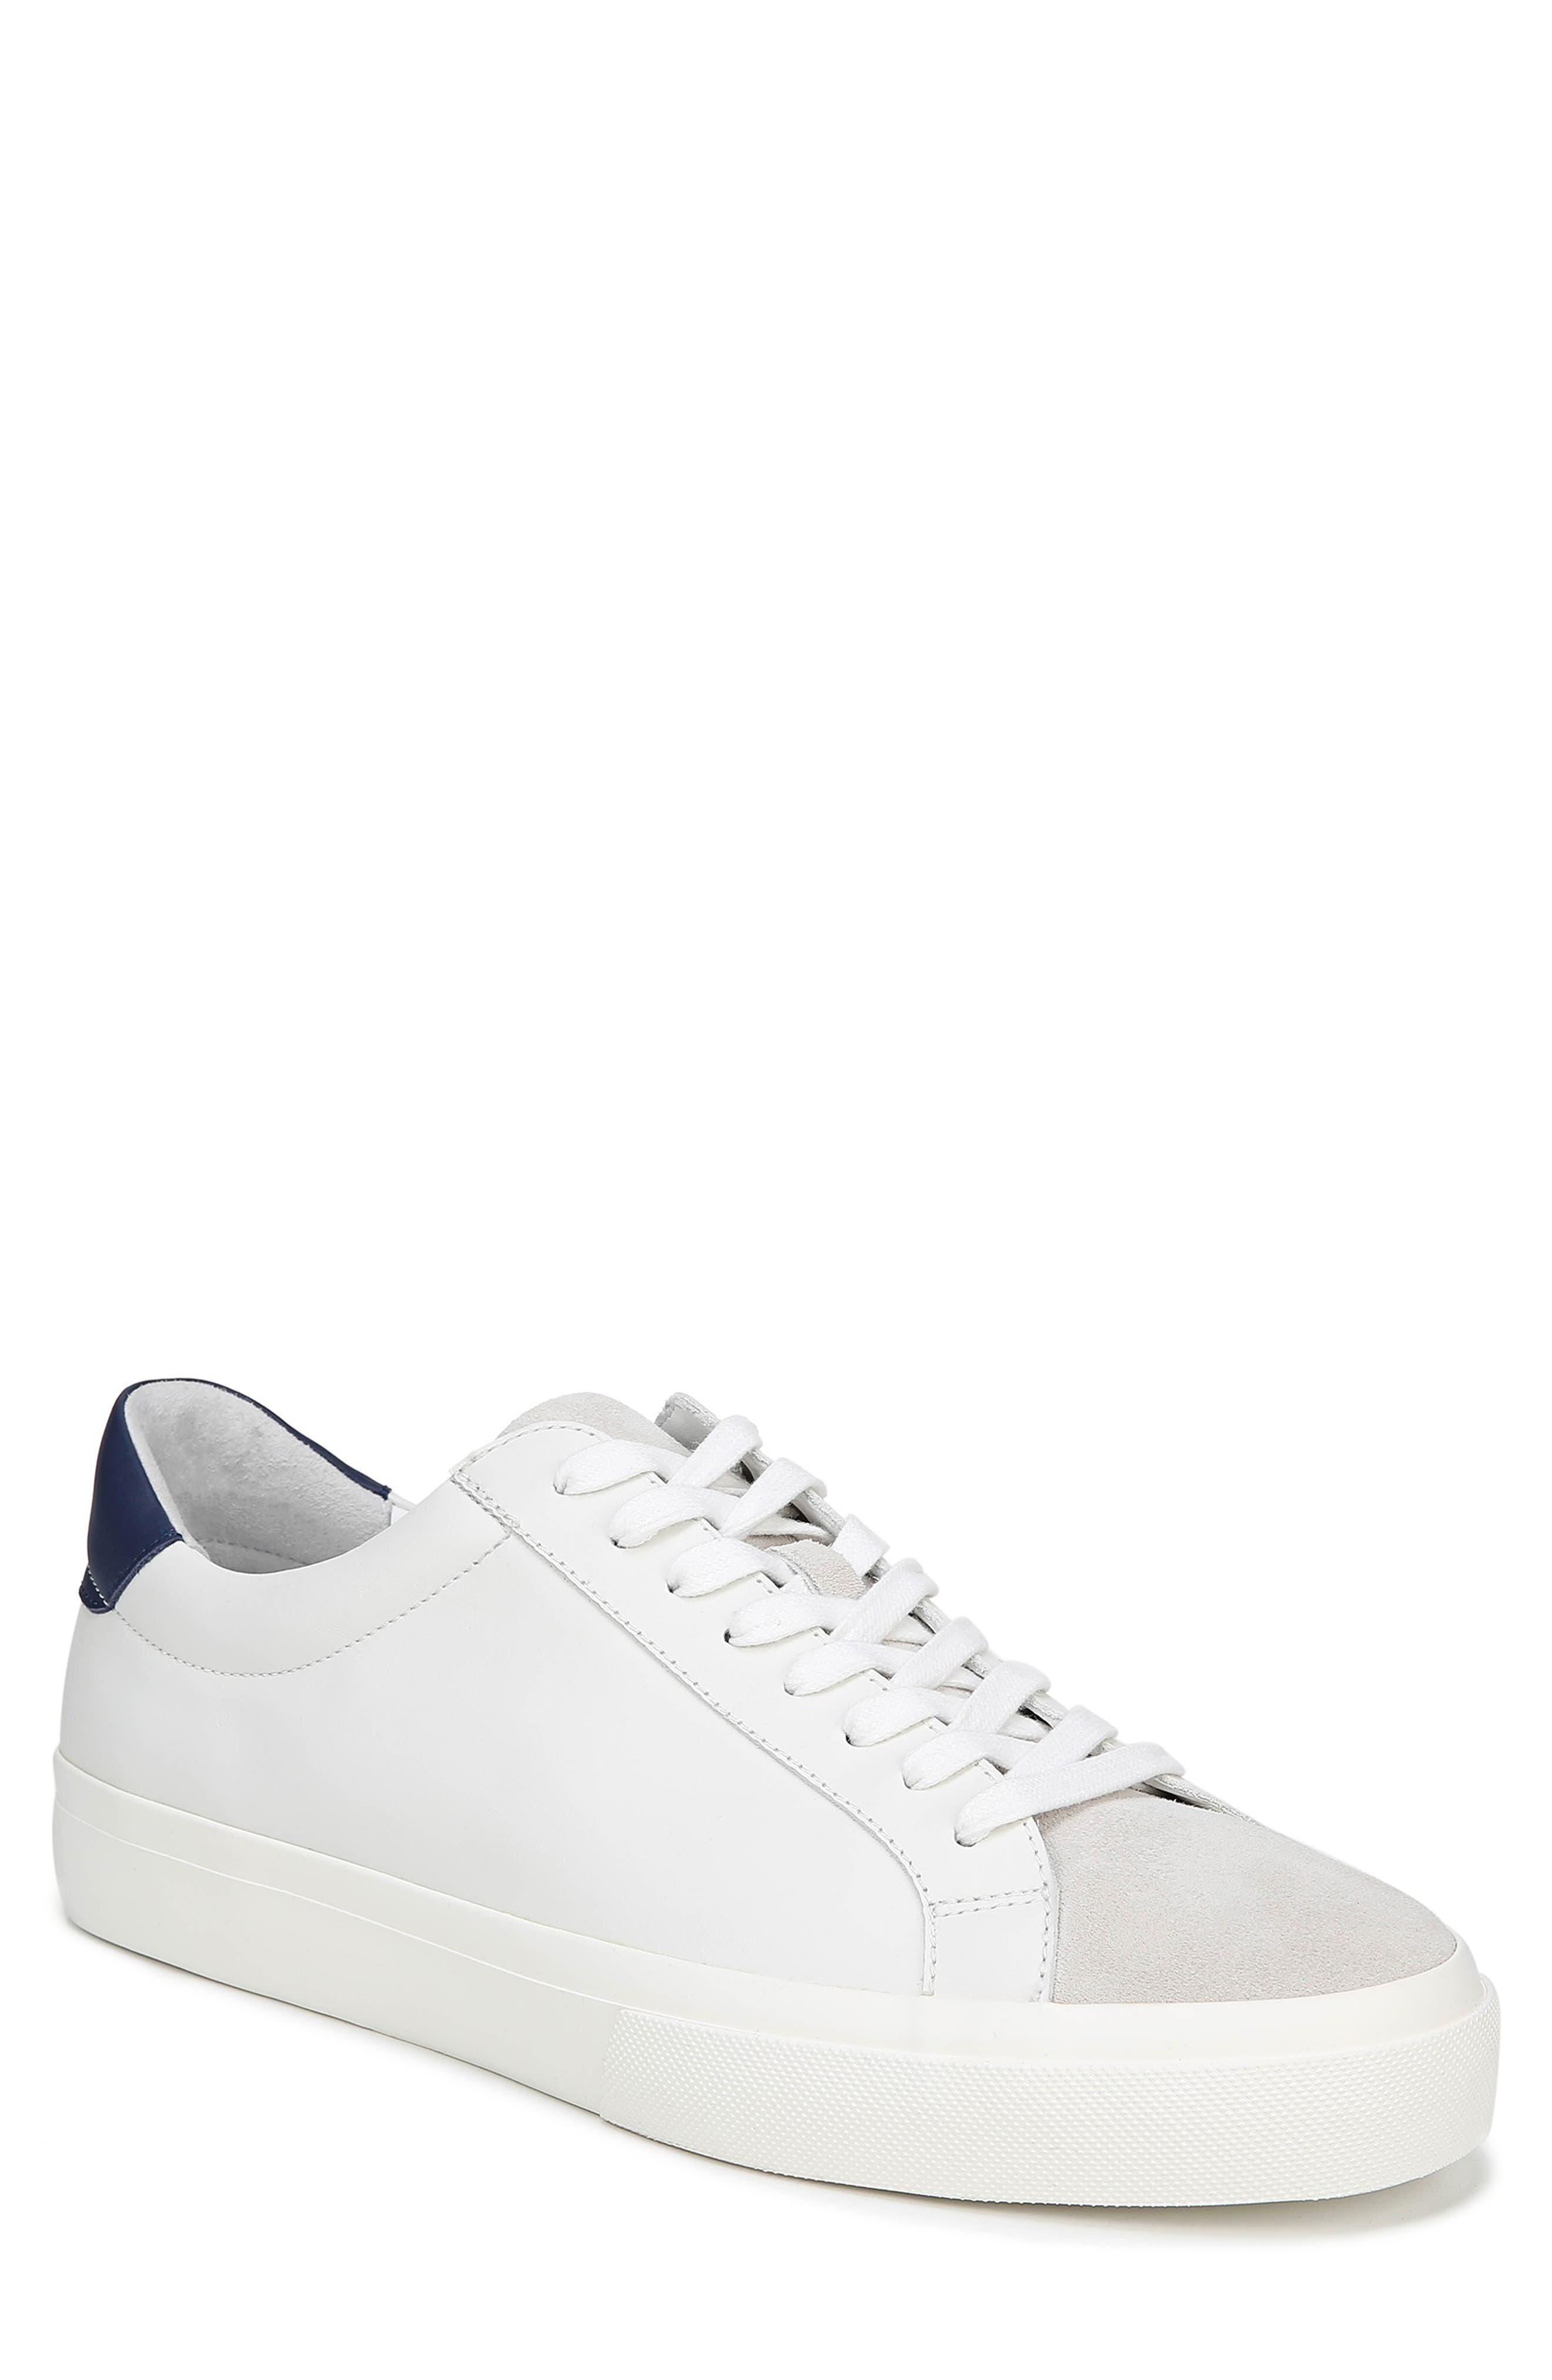 Men's Vince All-White Sneakers   Nordstrom